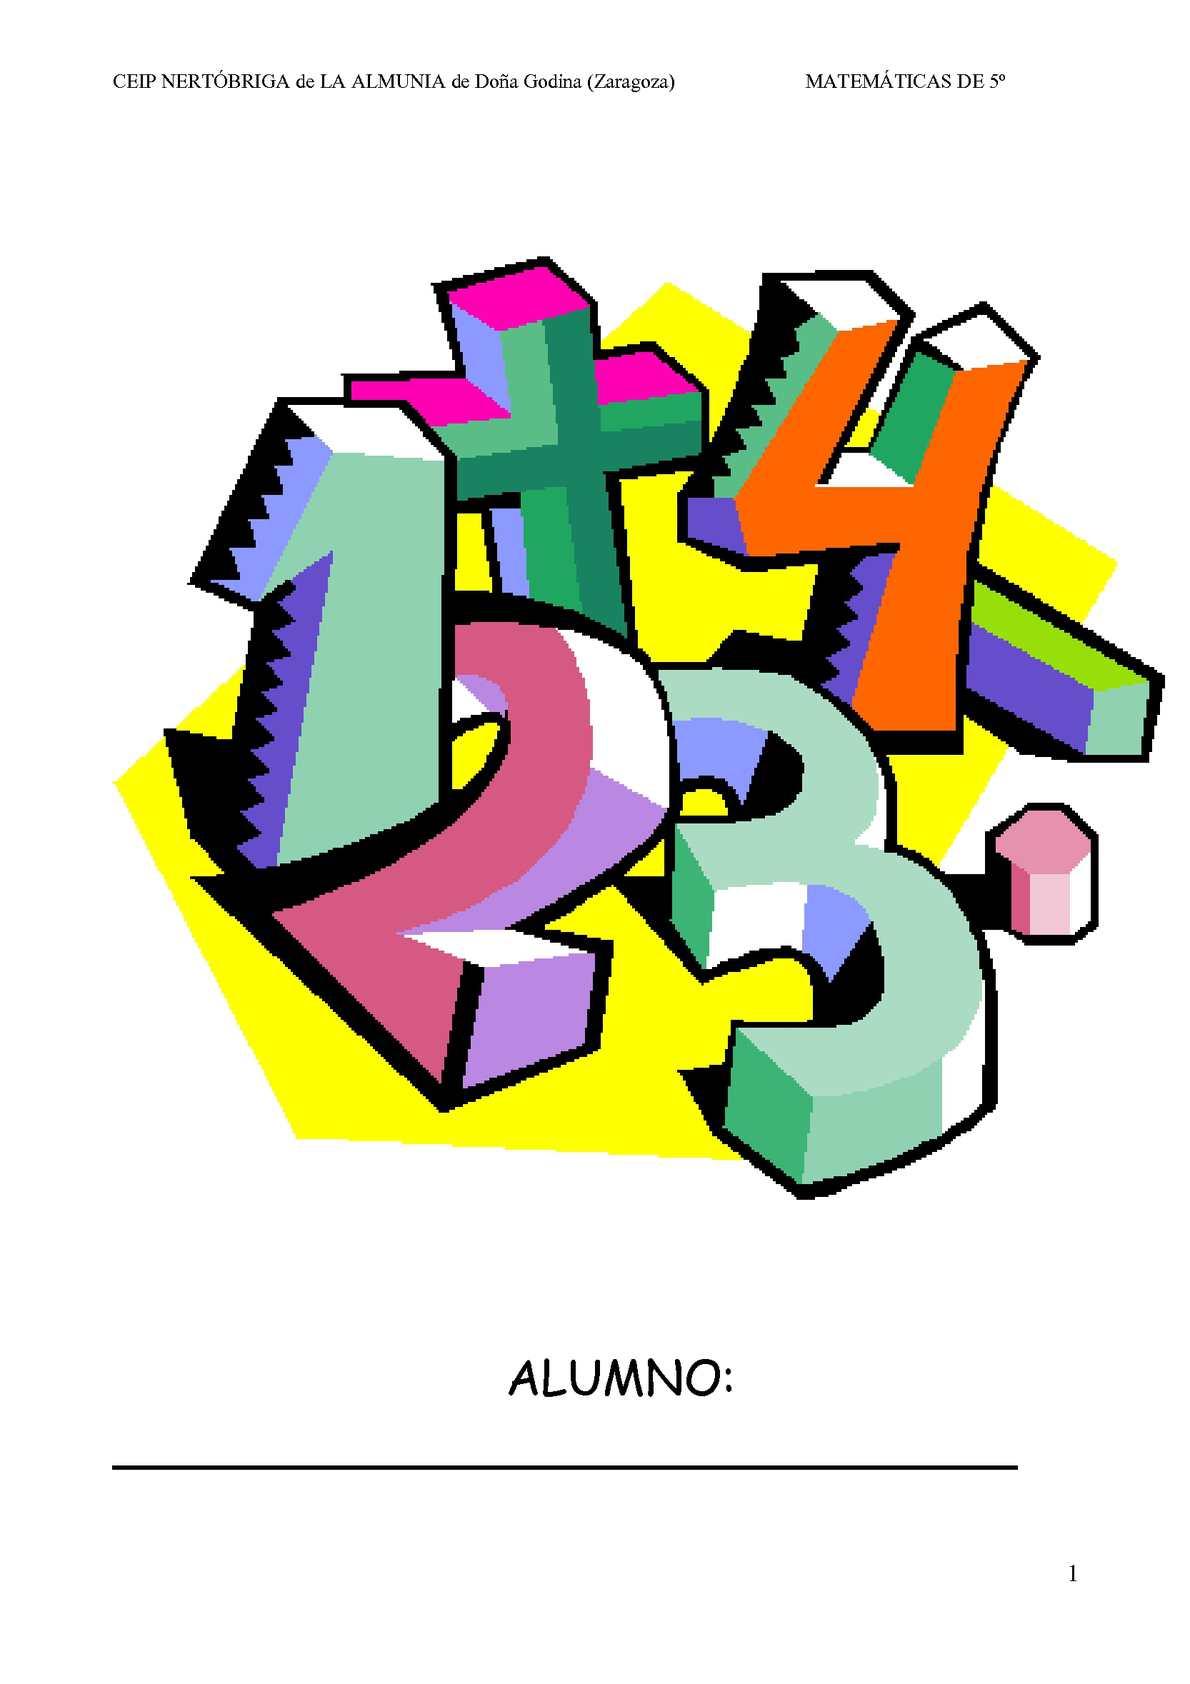 Calaméo - Cuaderno de actividades matemáticas/ 5º primaria